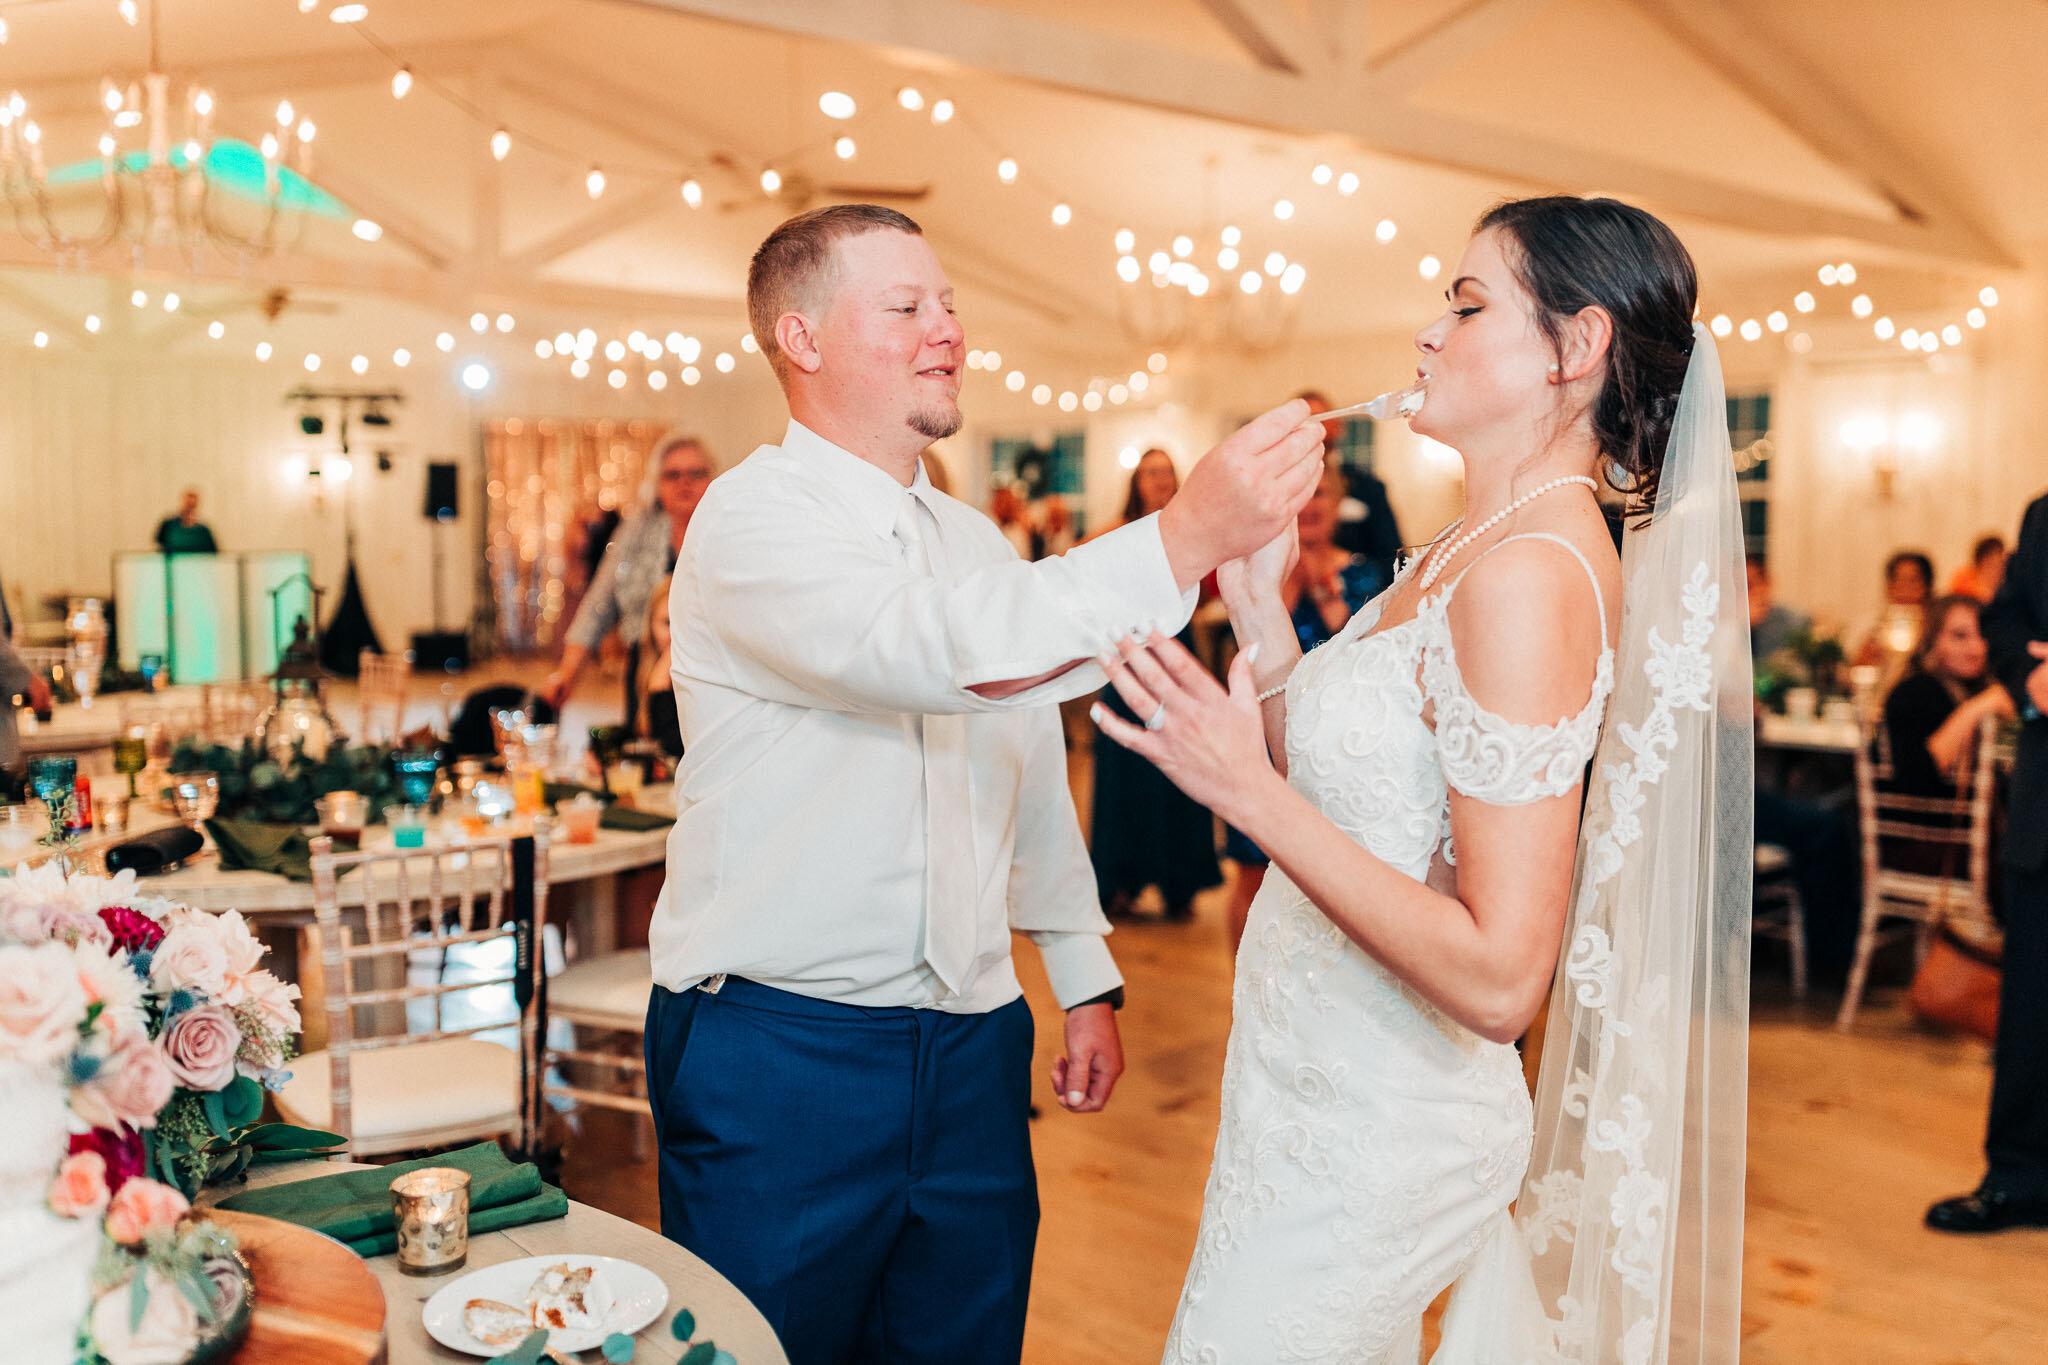 whitewoods-fall-wedding-8623.jpg